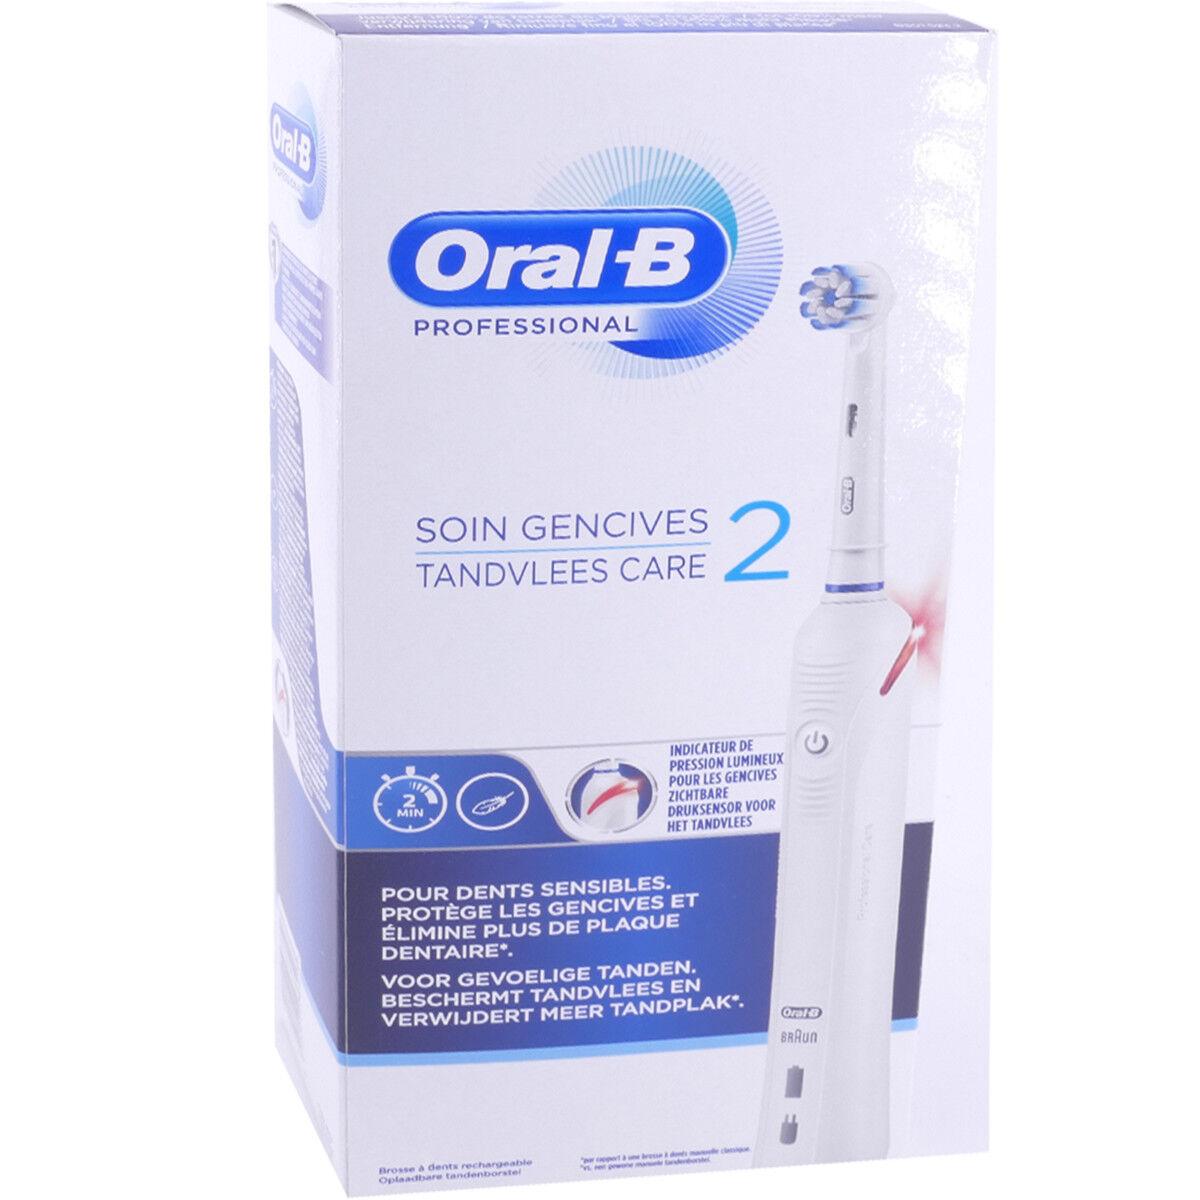 ORAL B Oral-b soin gencives 2 brosse electrique